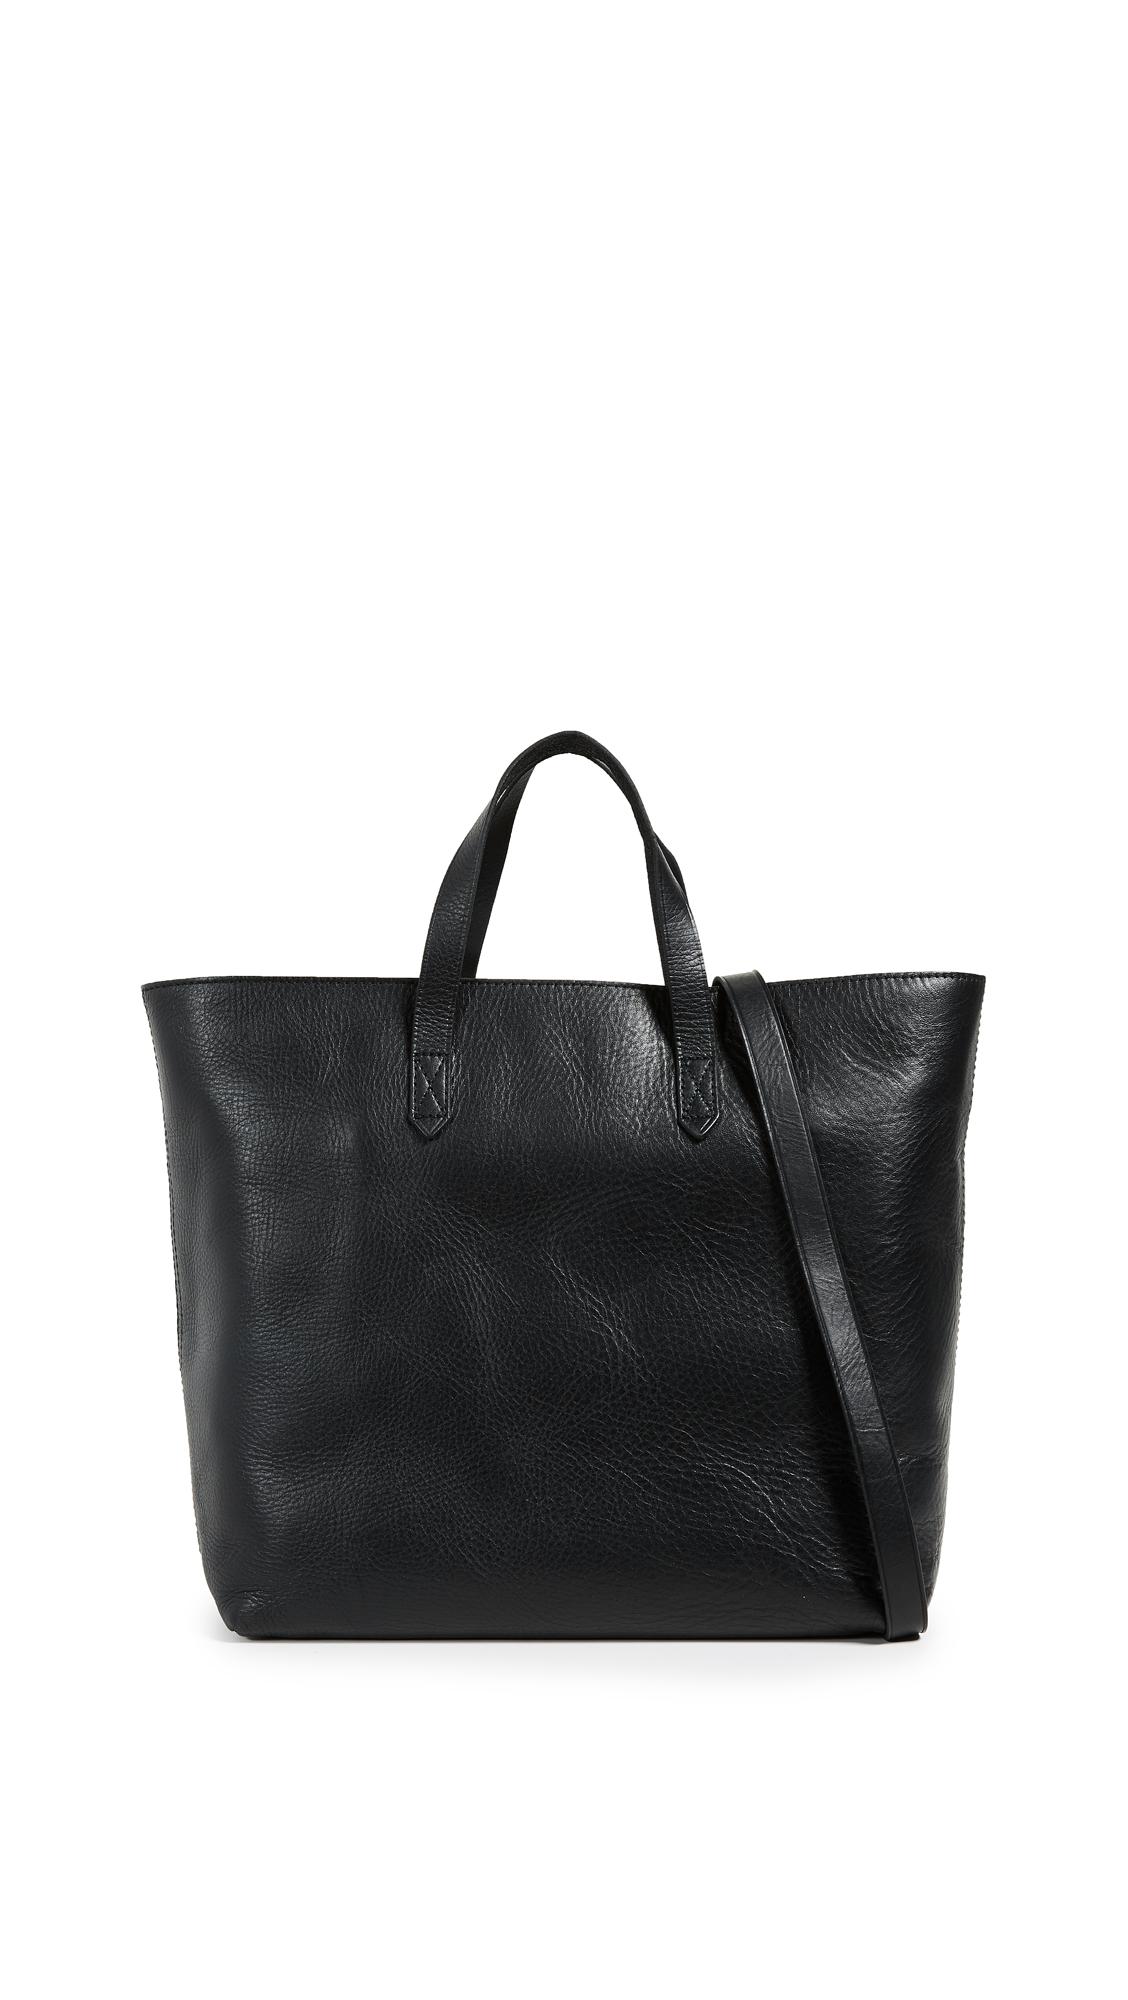 Madewell Zipper Transport Bag - Black/Black